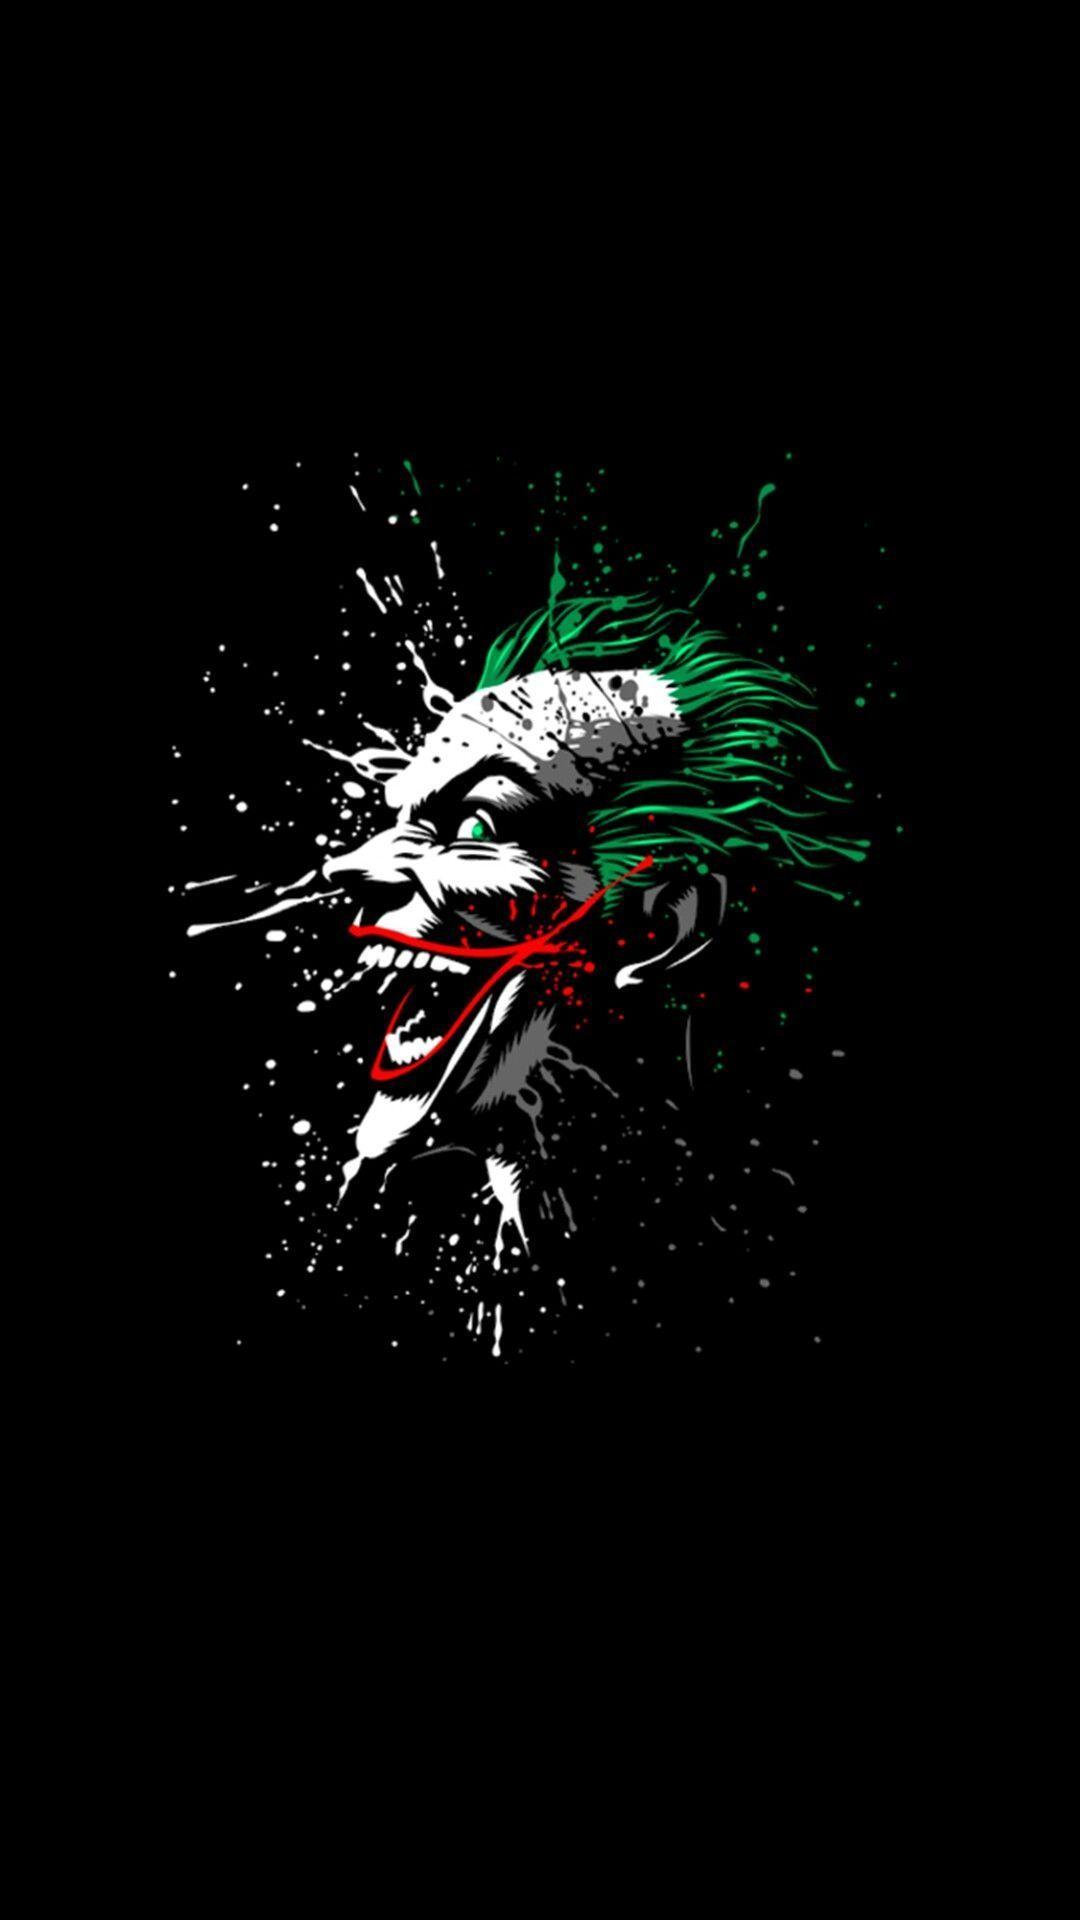 Joker Why So Serious Wallpaper Android Batman Joker Wallpaper Joker Wallpapers Joker Artwork